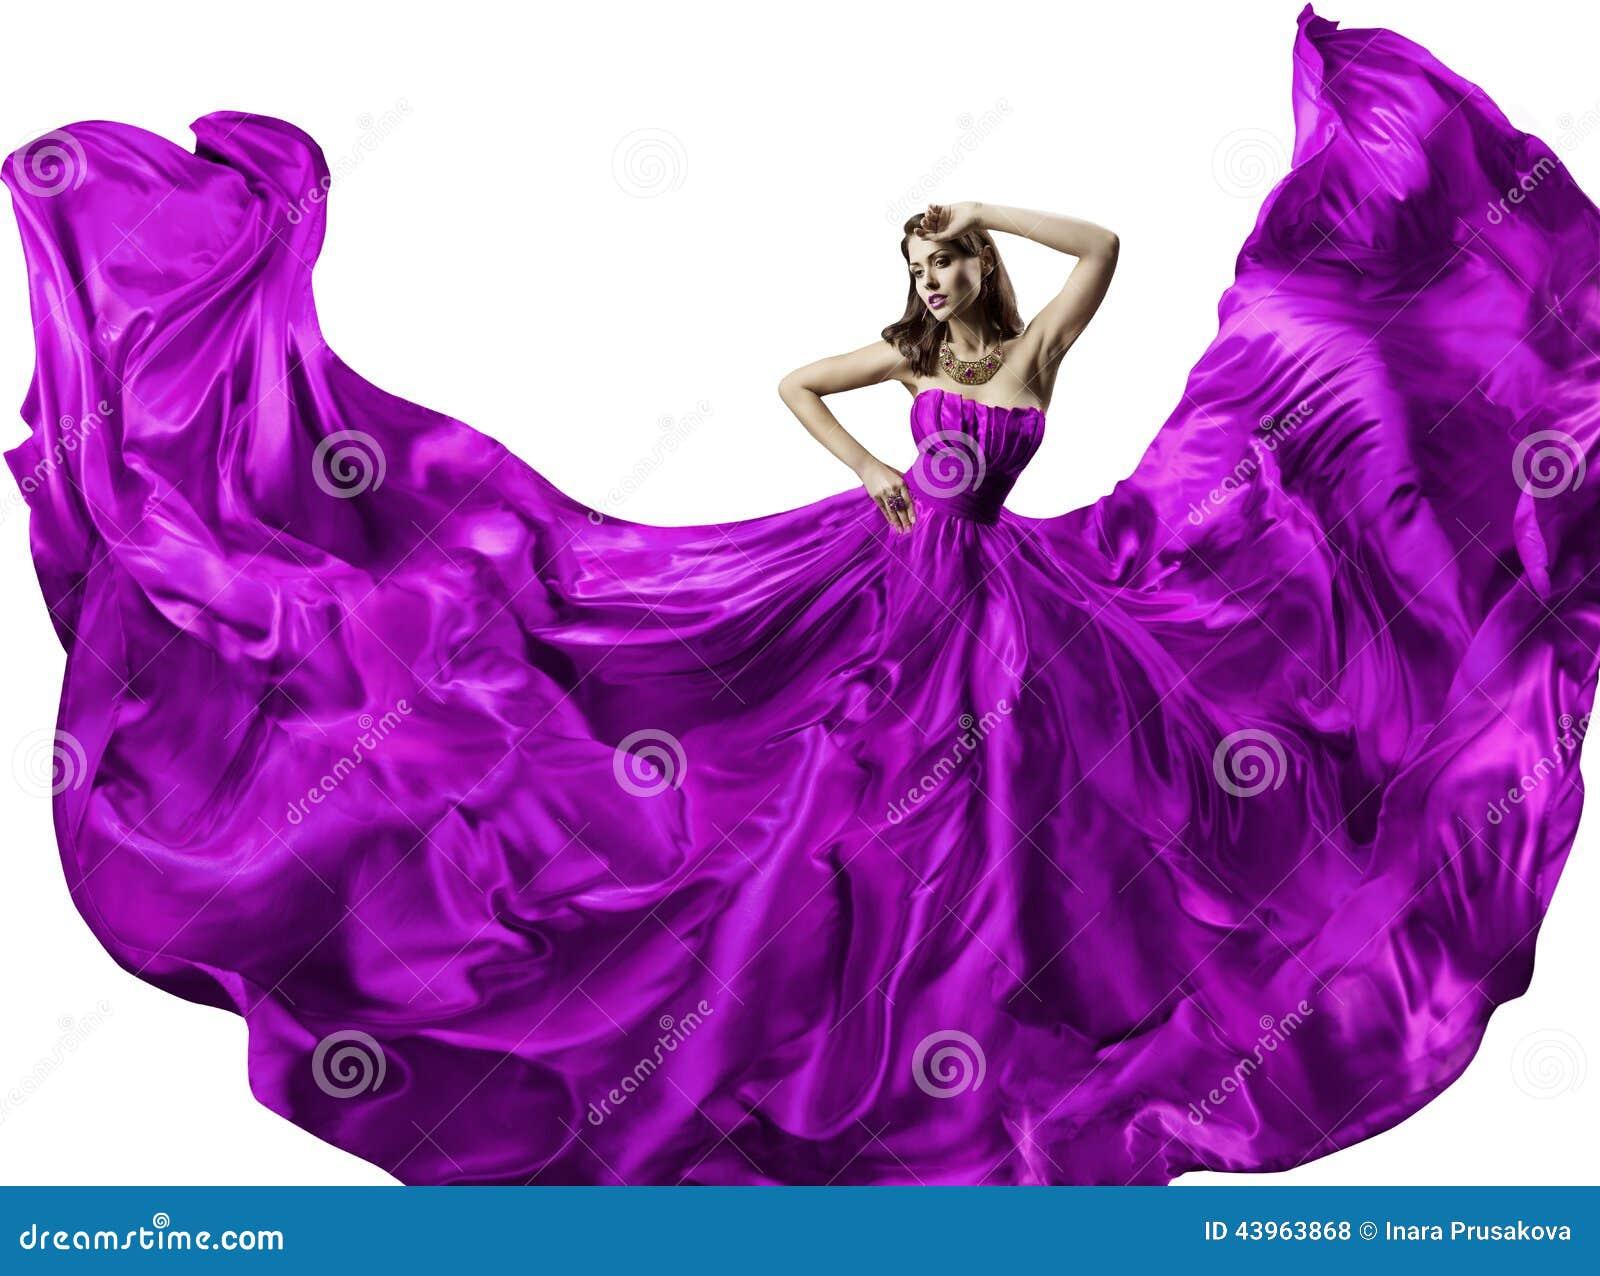 Woman Silk Dress Beauty Fashion Portrait Long Fluttering Gown Stock Photo Image 43963868